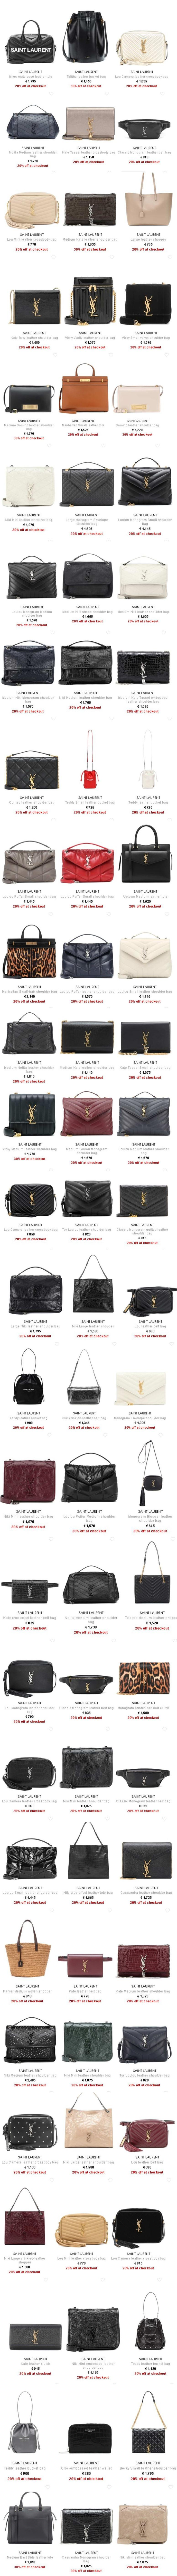 歐美精品折扣: Saint Laurent 8折!!  niki medium bag/ lou lou 相機包/ college bag